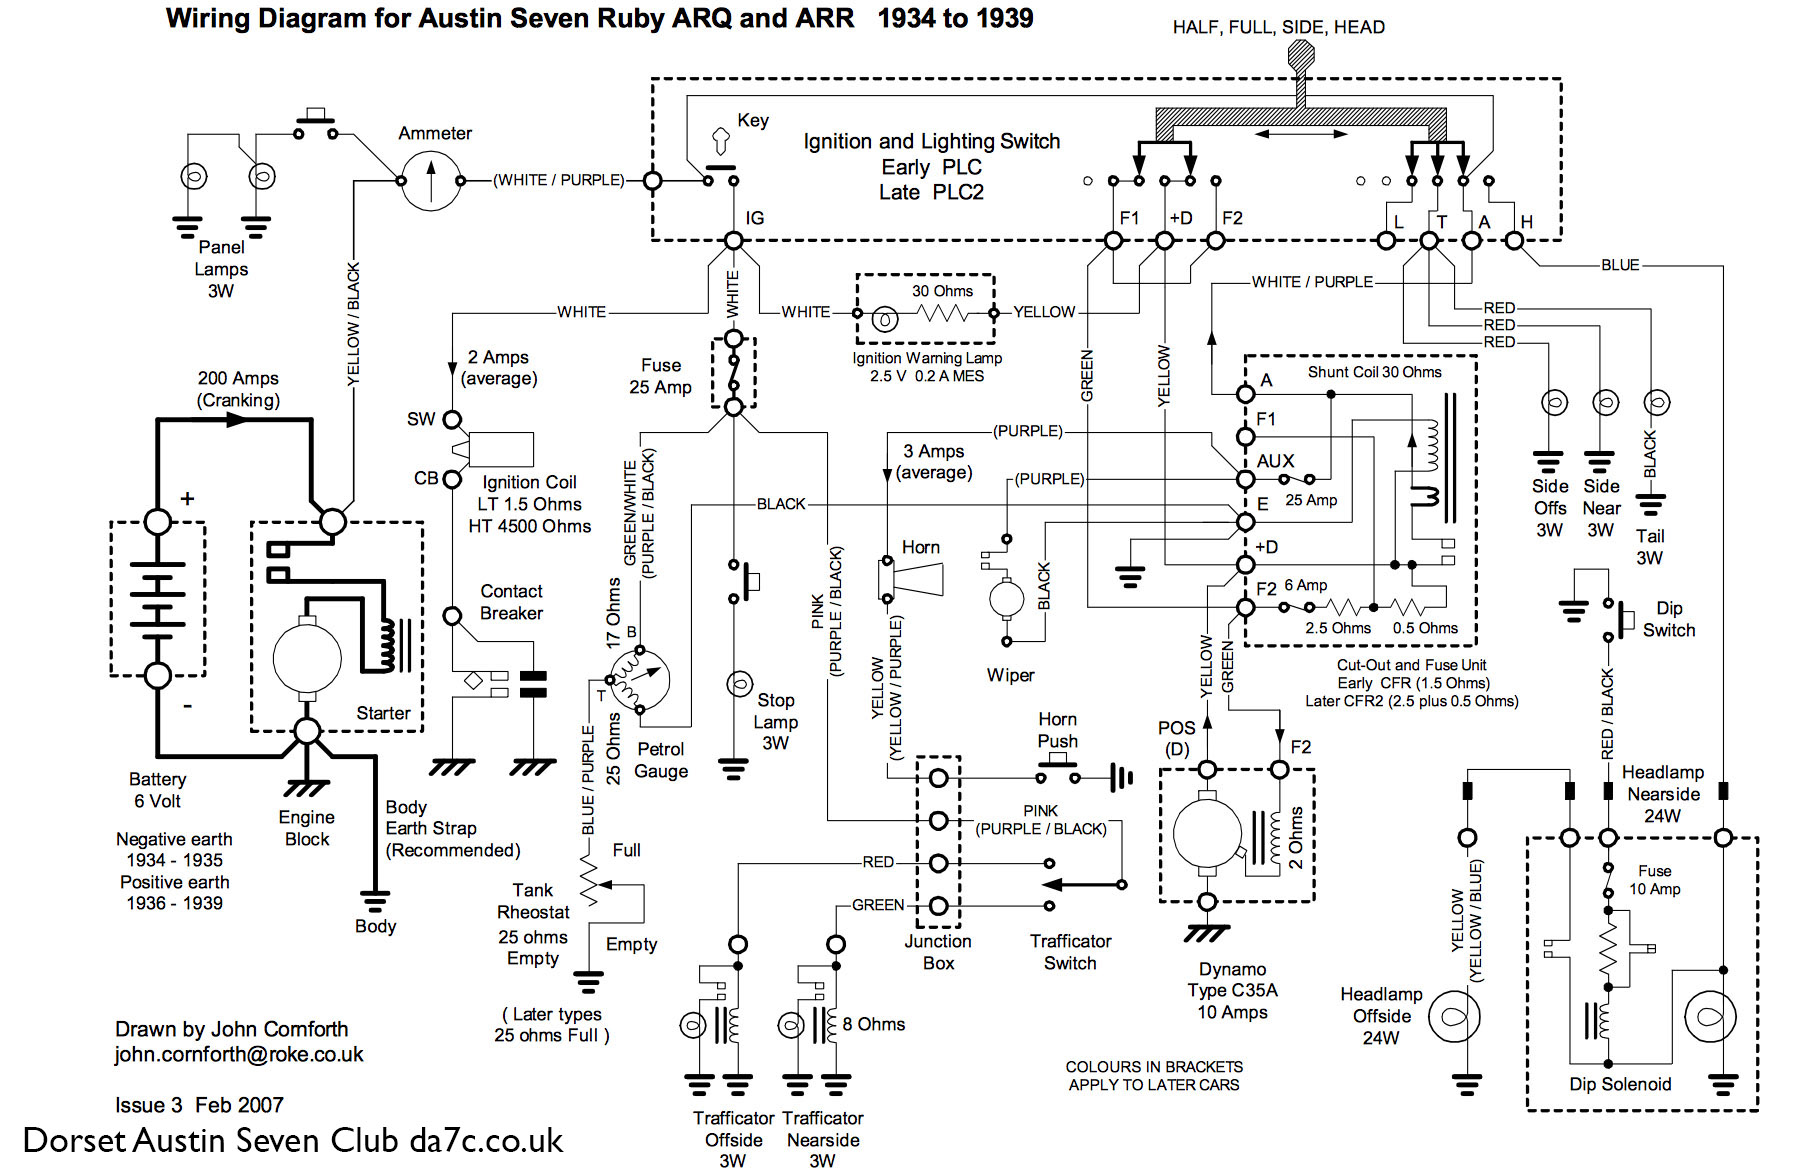 hight resolution of da7cwiring kohler wiring diagram kohler compressor wiring diagram odicis kohler cv730s wiring diagram at highcare